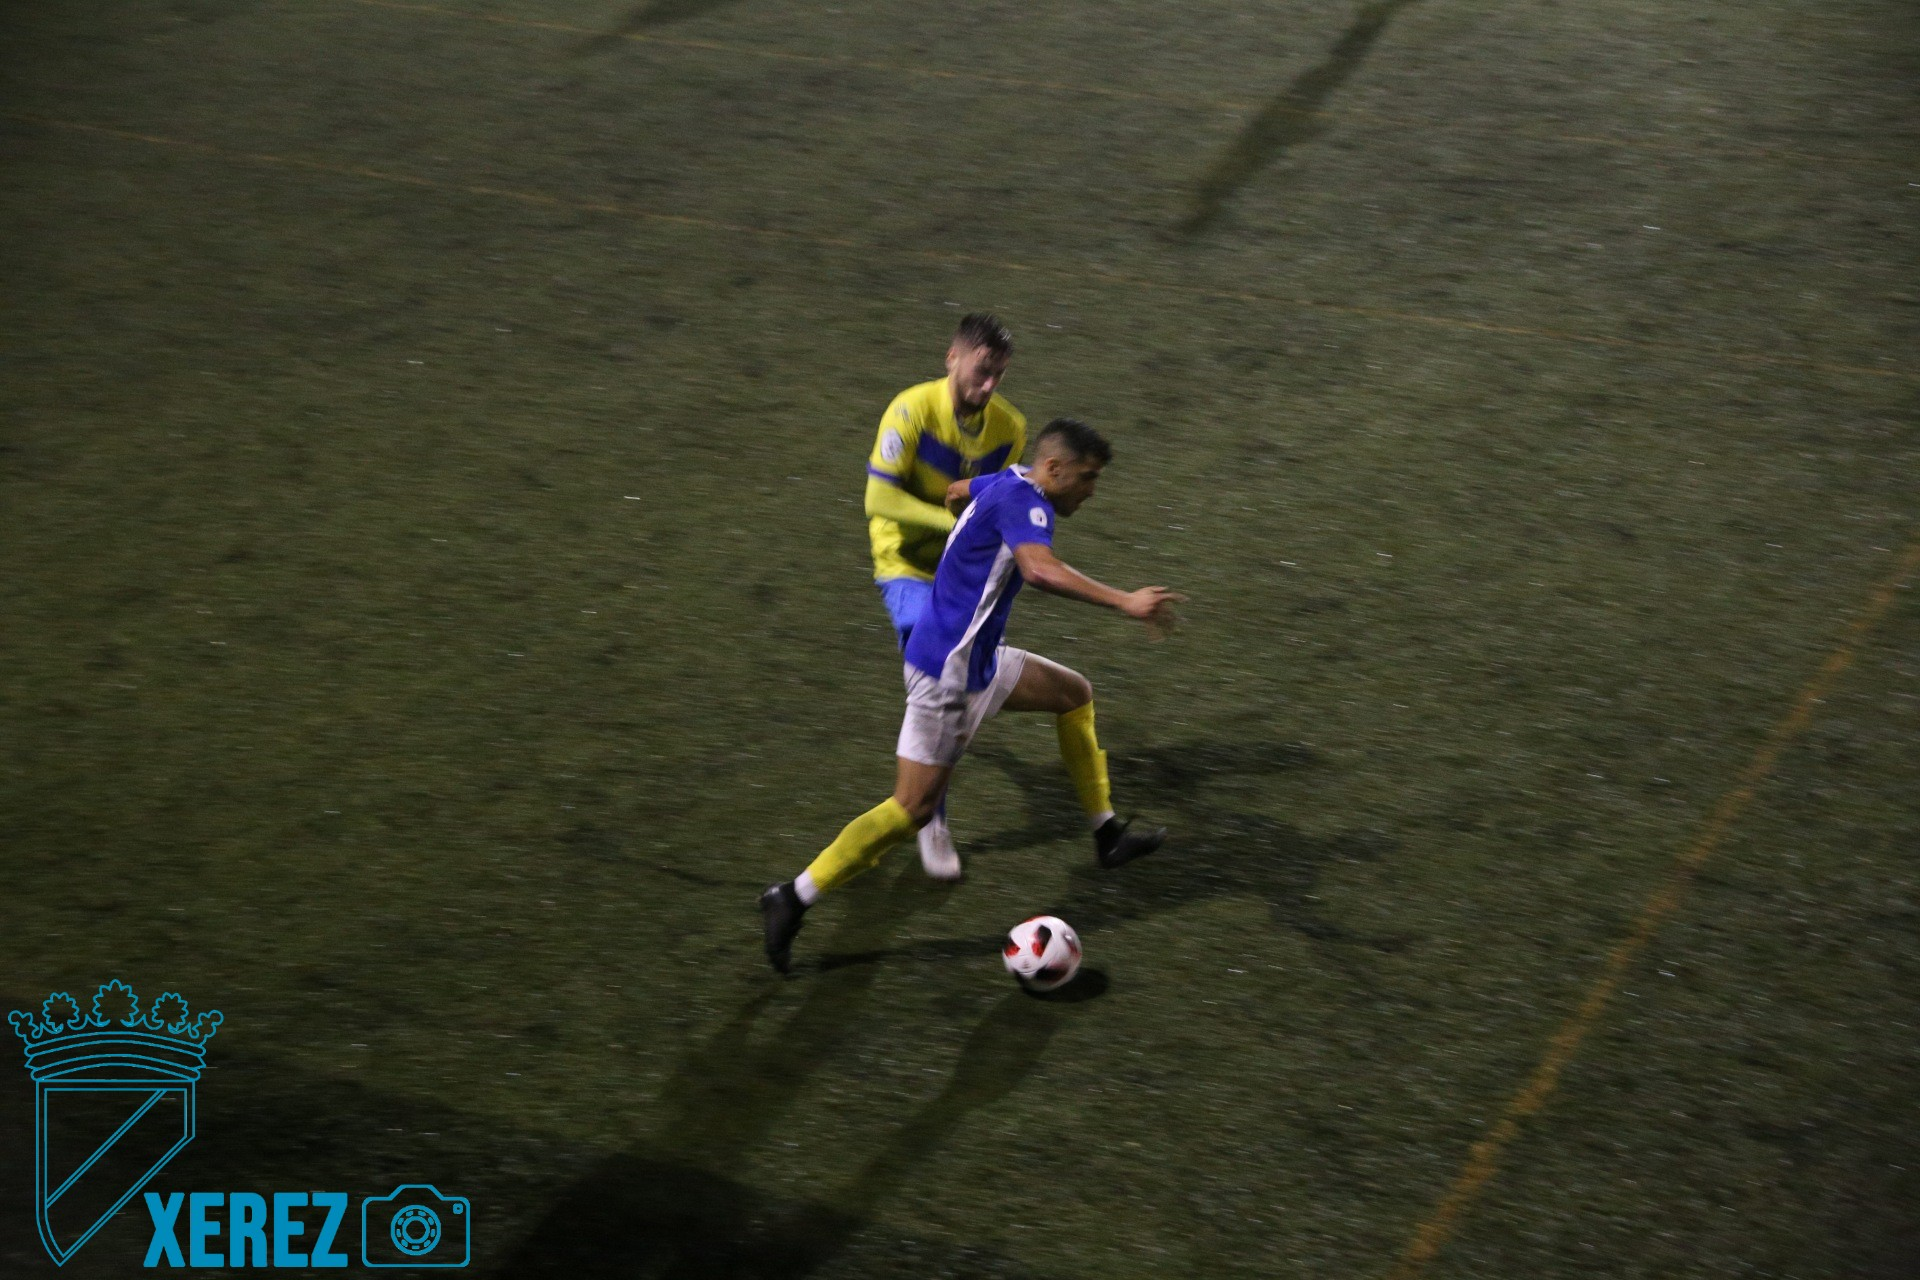 http://www.xerezclubdeportivo.es/wp-content/uploads/2019/01/20190119202600_IMG_6065_wm.jpg